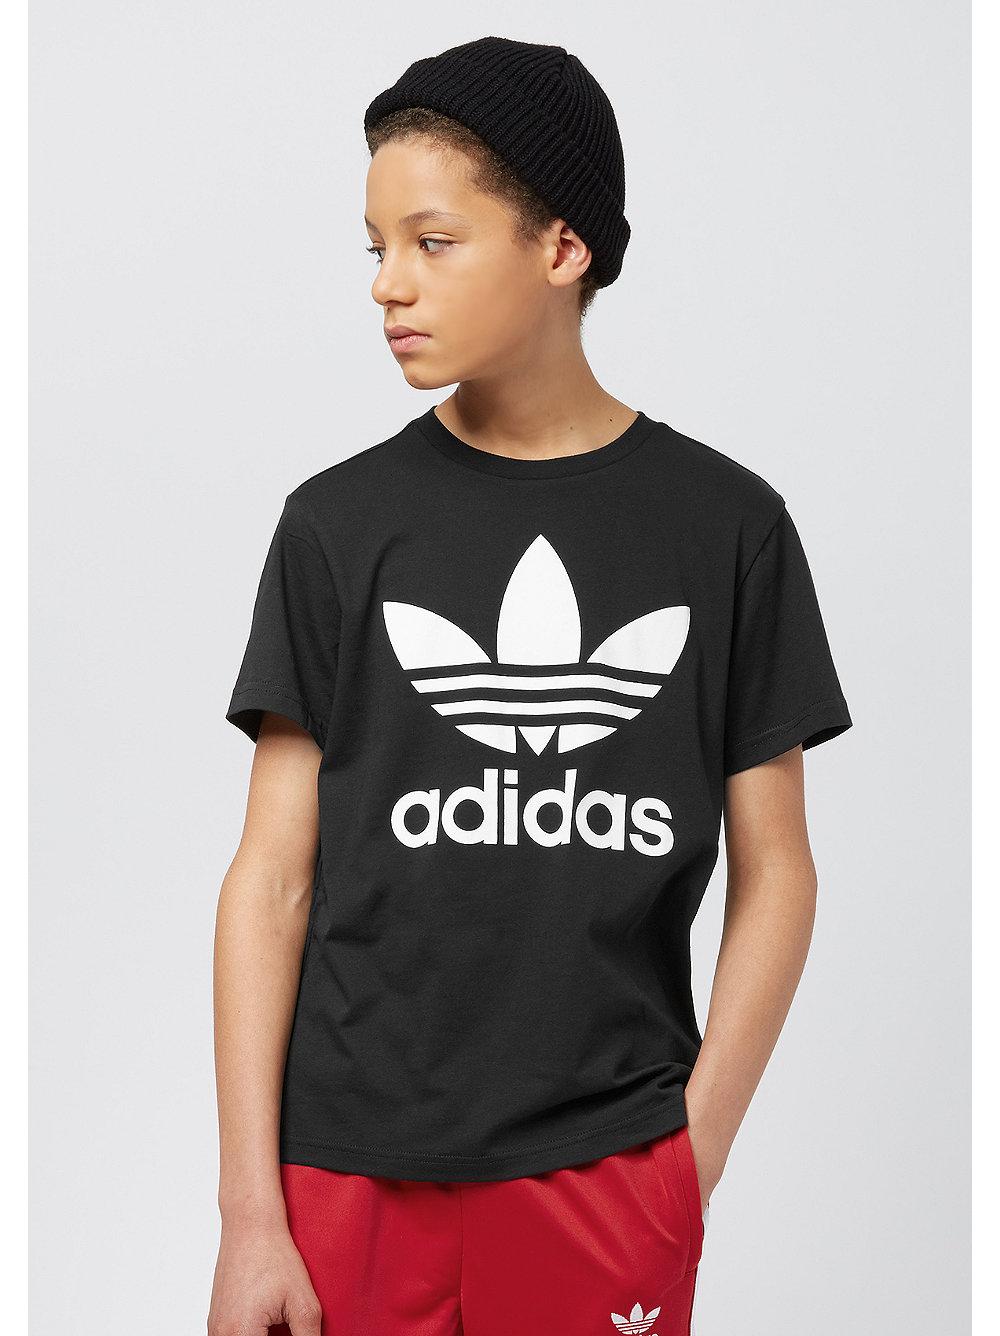 adidas Junior Trefoil black-white